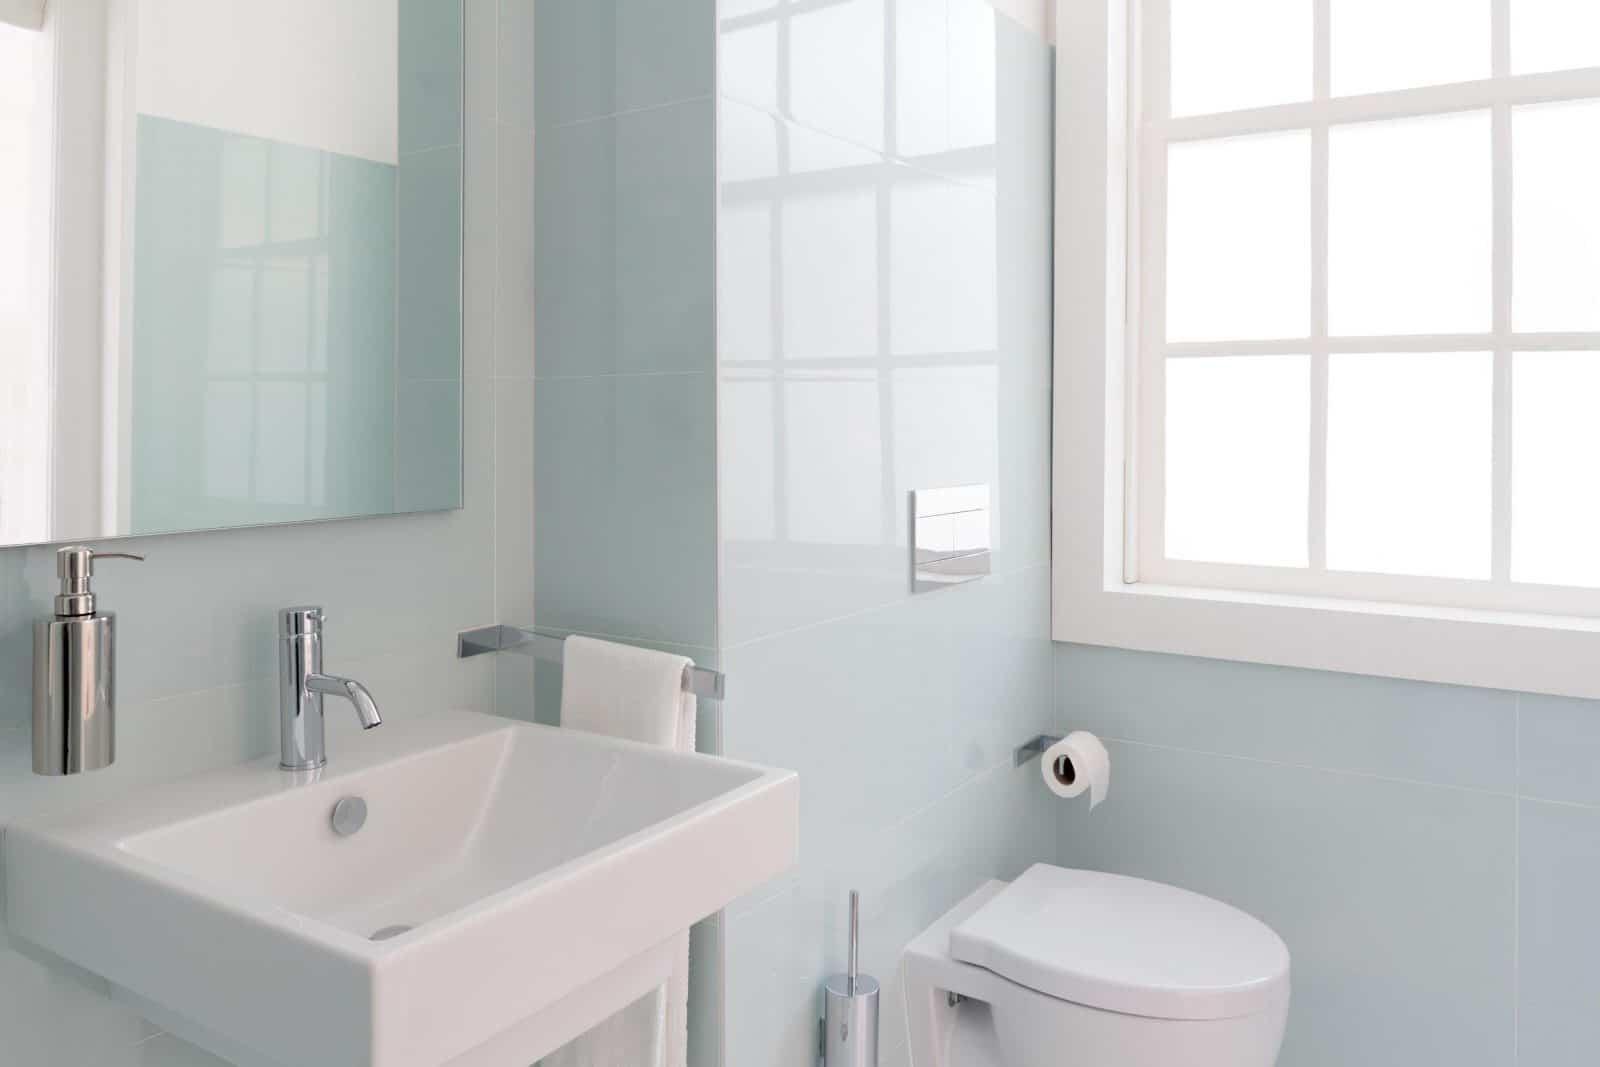 Roller blinds for the bathroom